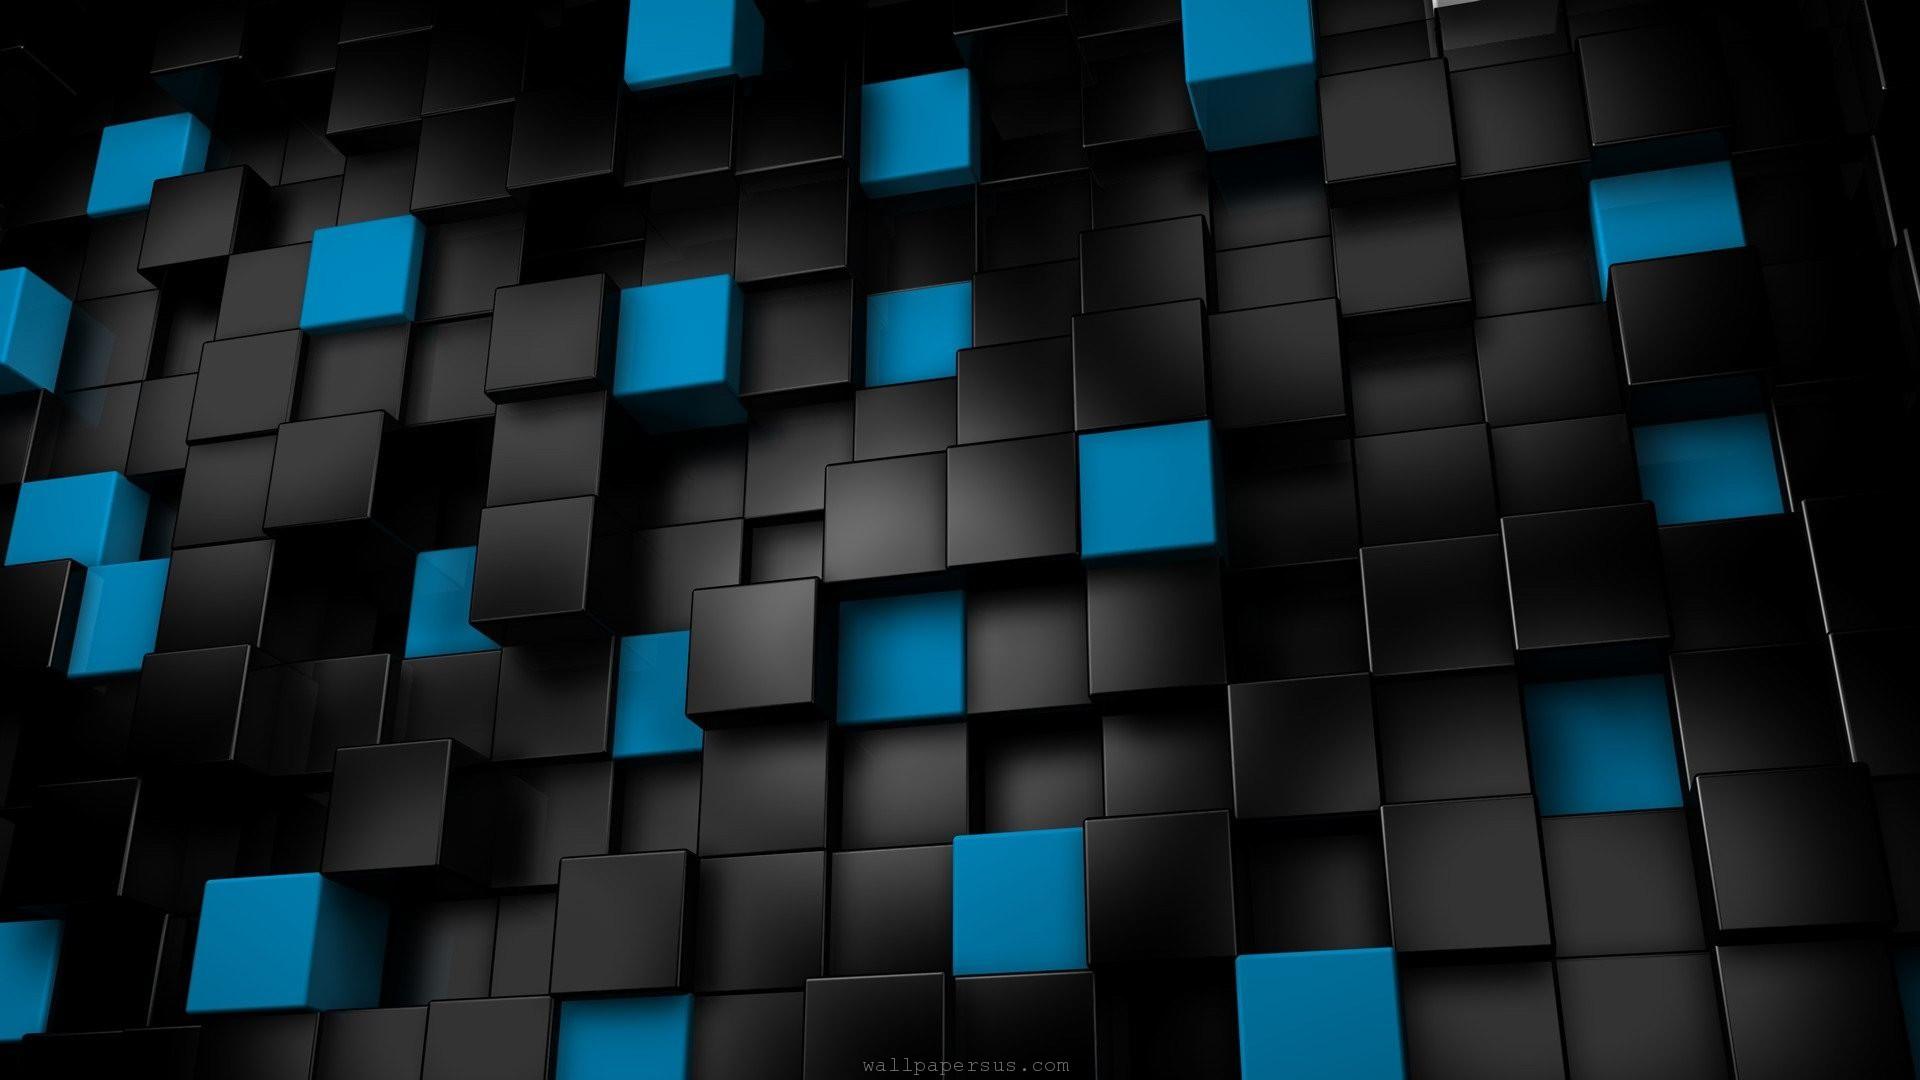 3d Background Wallpaper